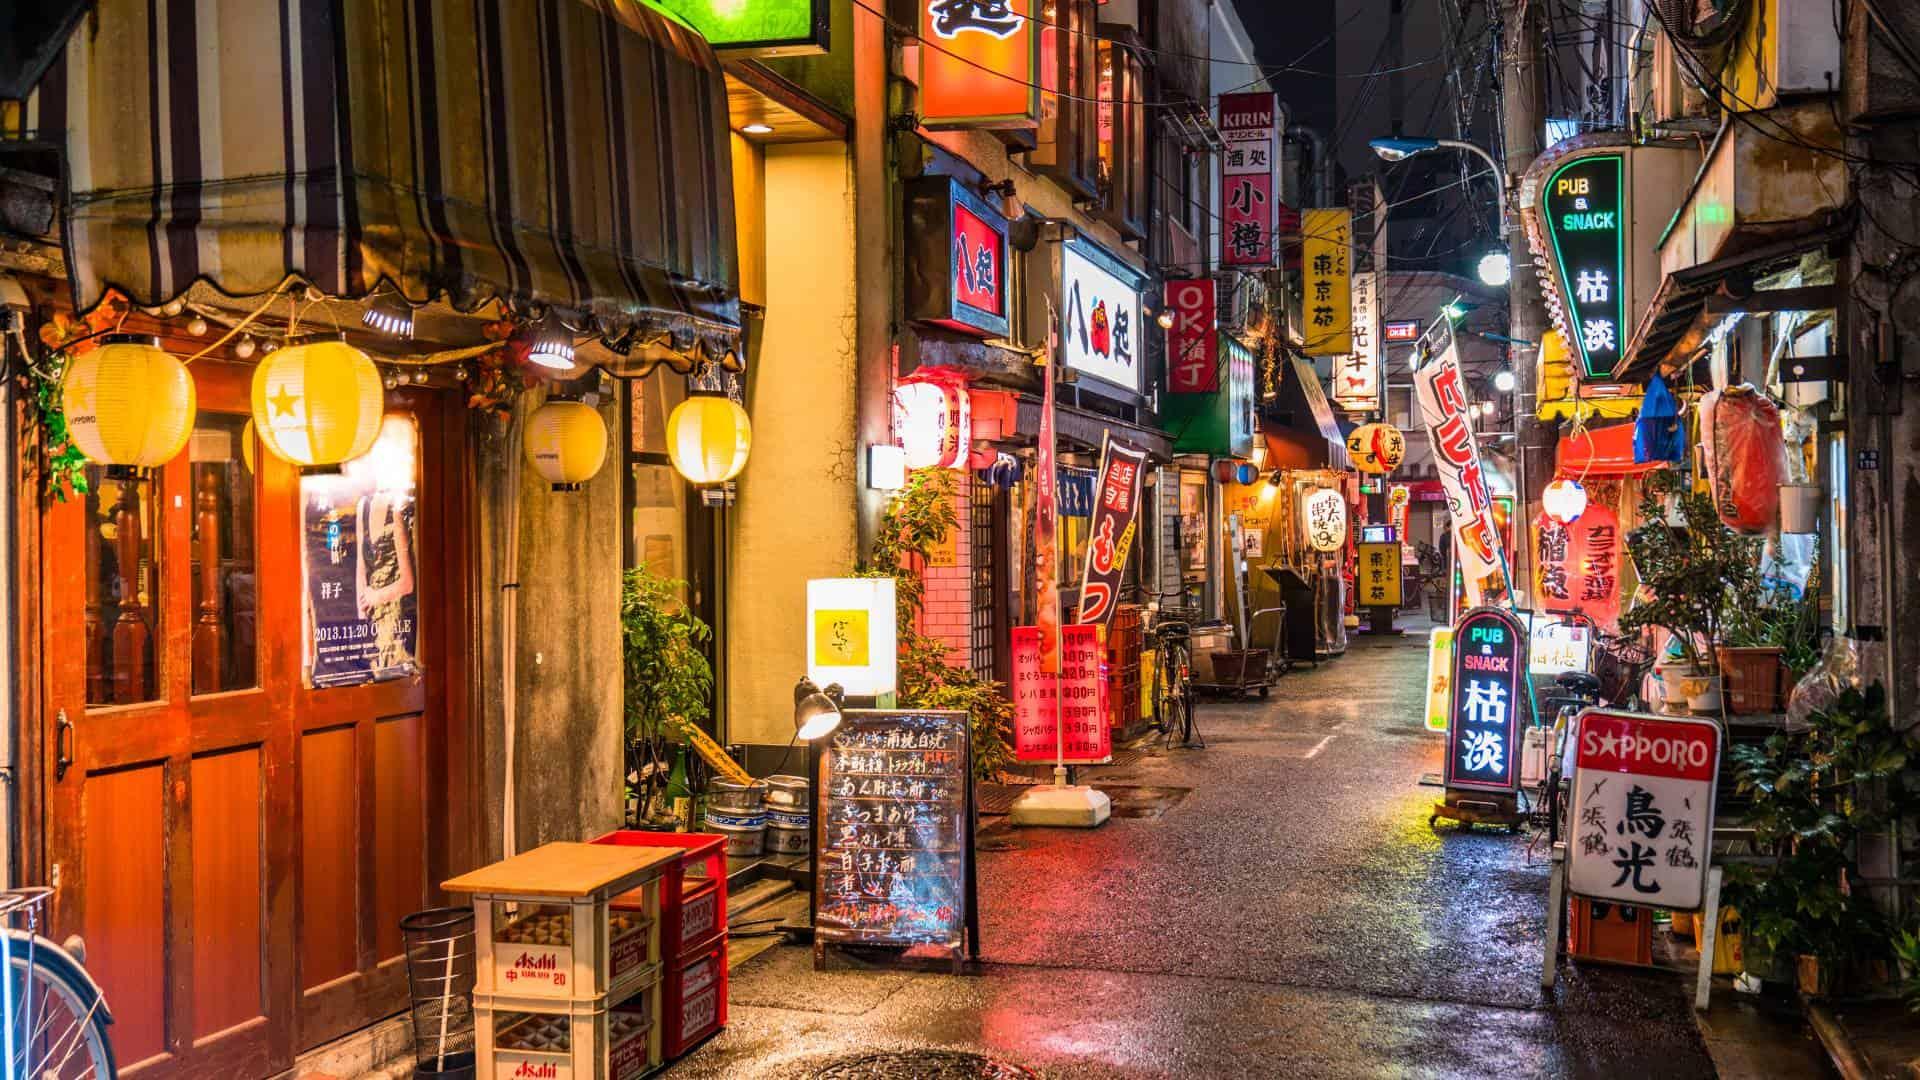 visit the Izakaya Alley tokyo